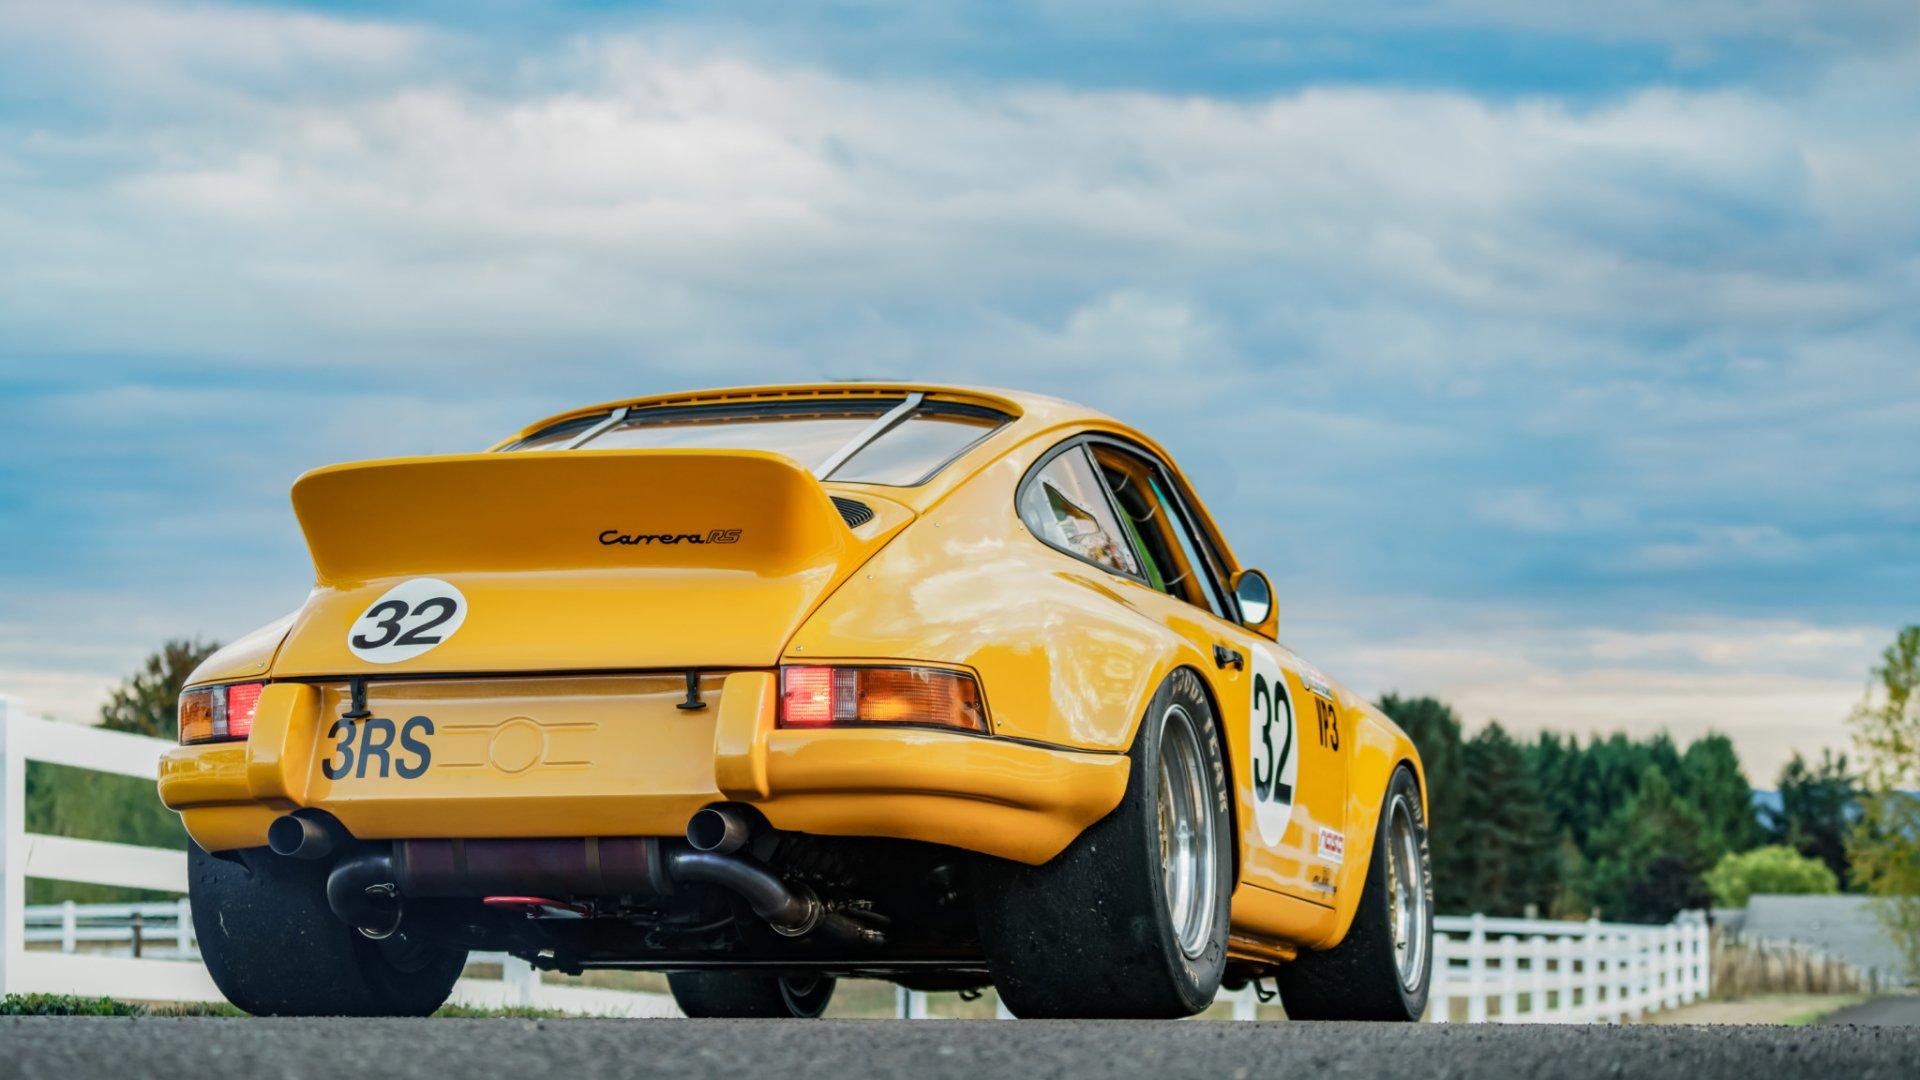 1970 Porsche 911S Race Car HD Wallpaper | Background Image ...